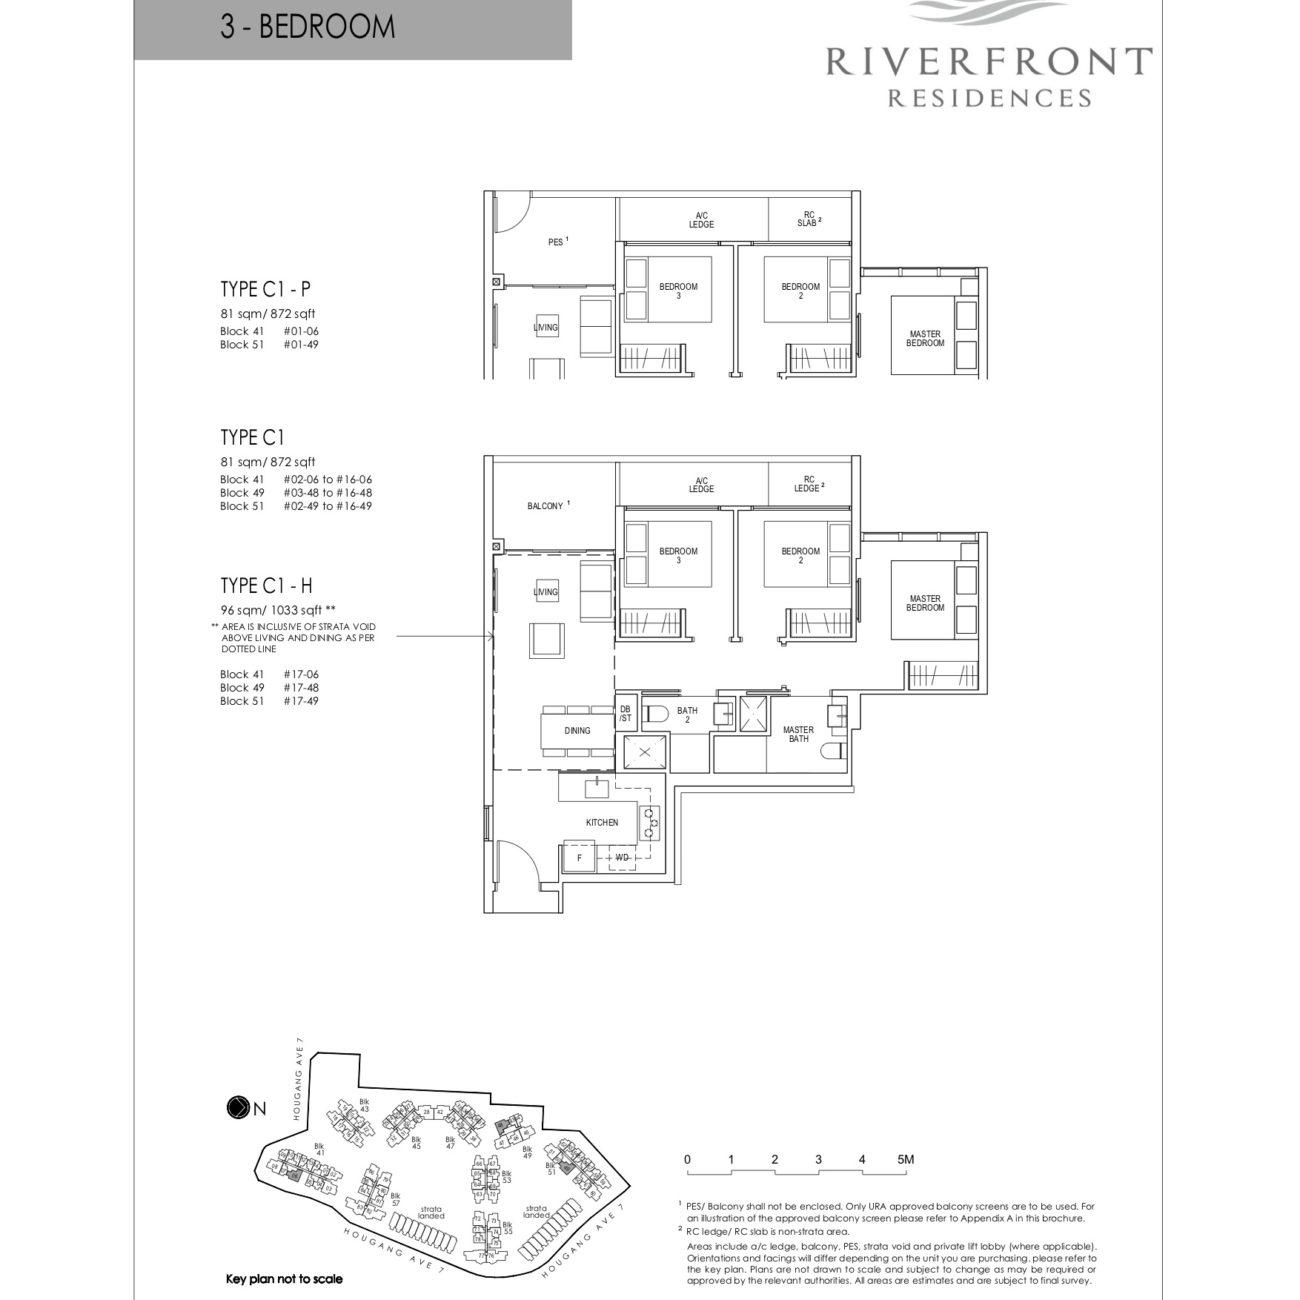 riverfront-residences-floorplan-3bedroom-c1